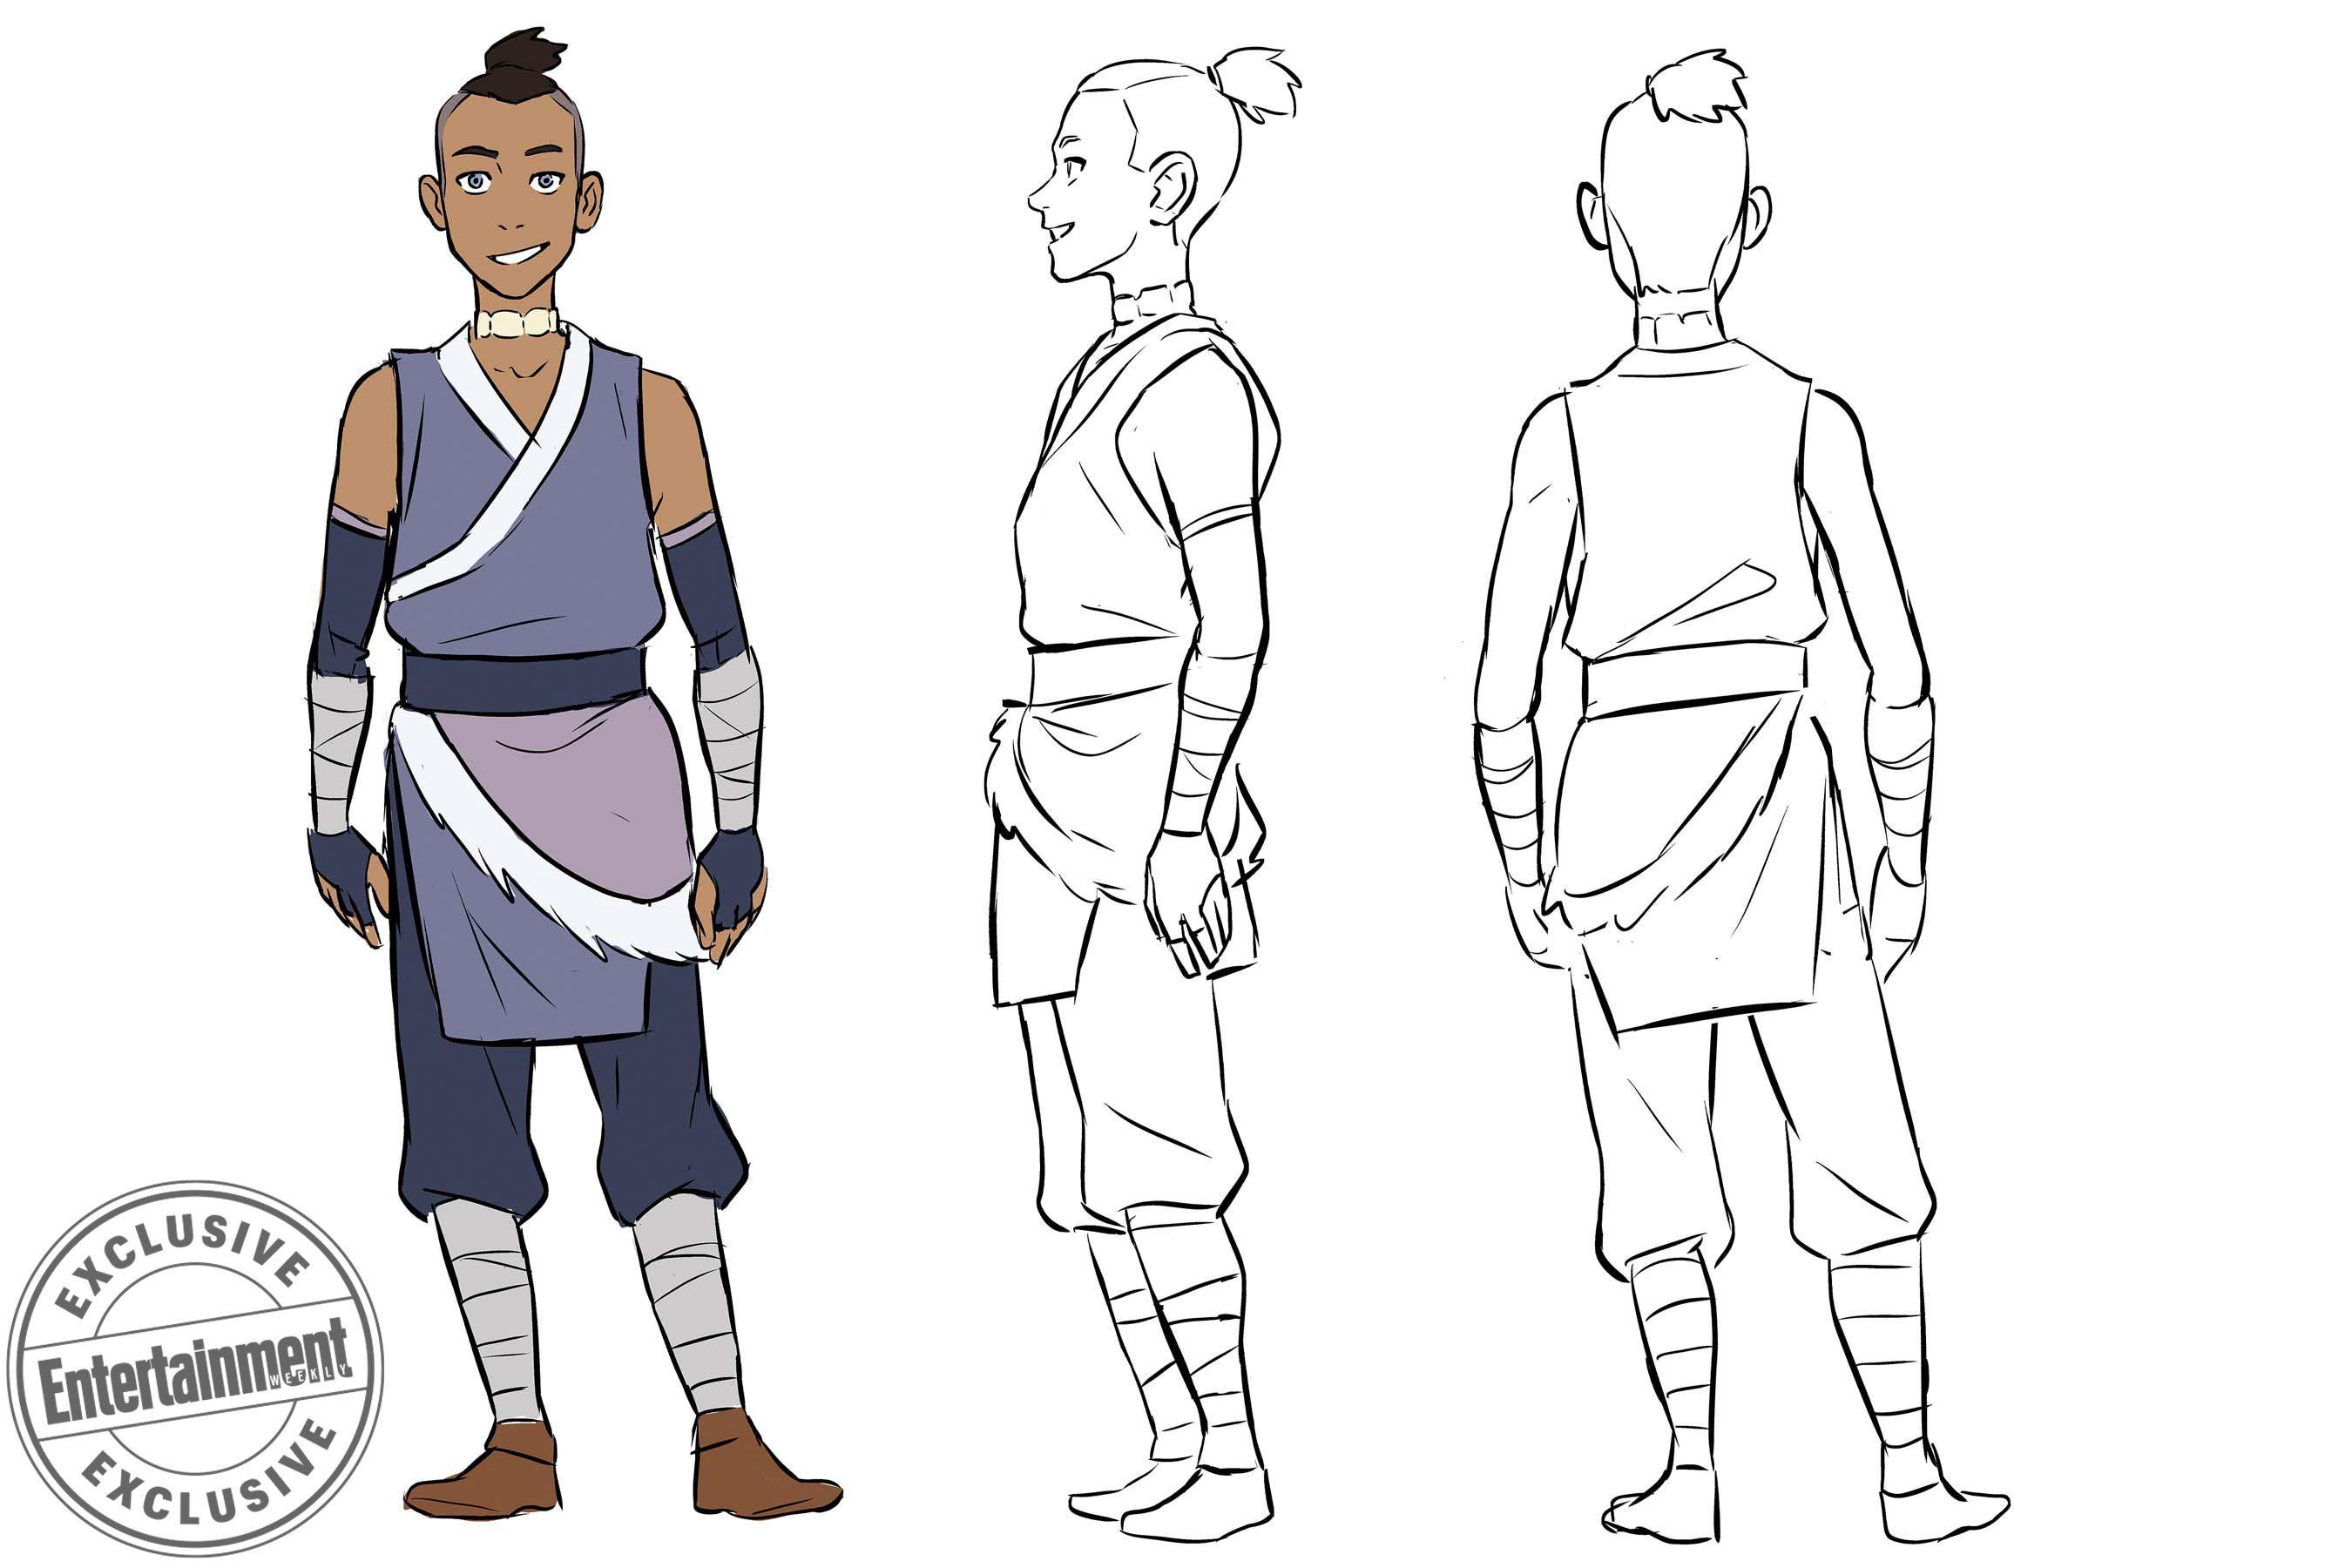 avatar character design avatar the last airbender character designer - yaser.vtngcf